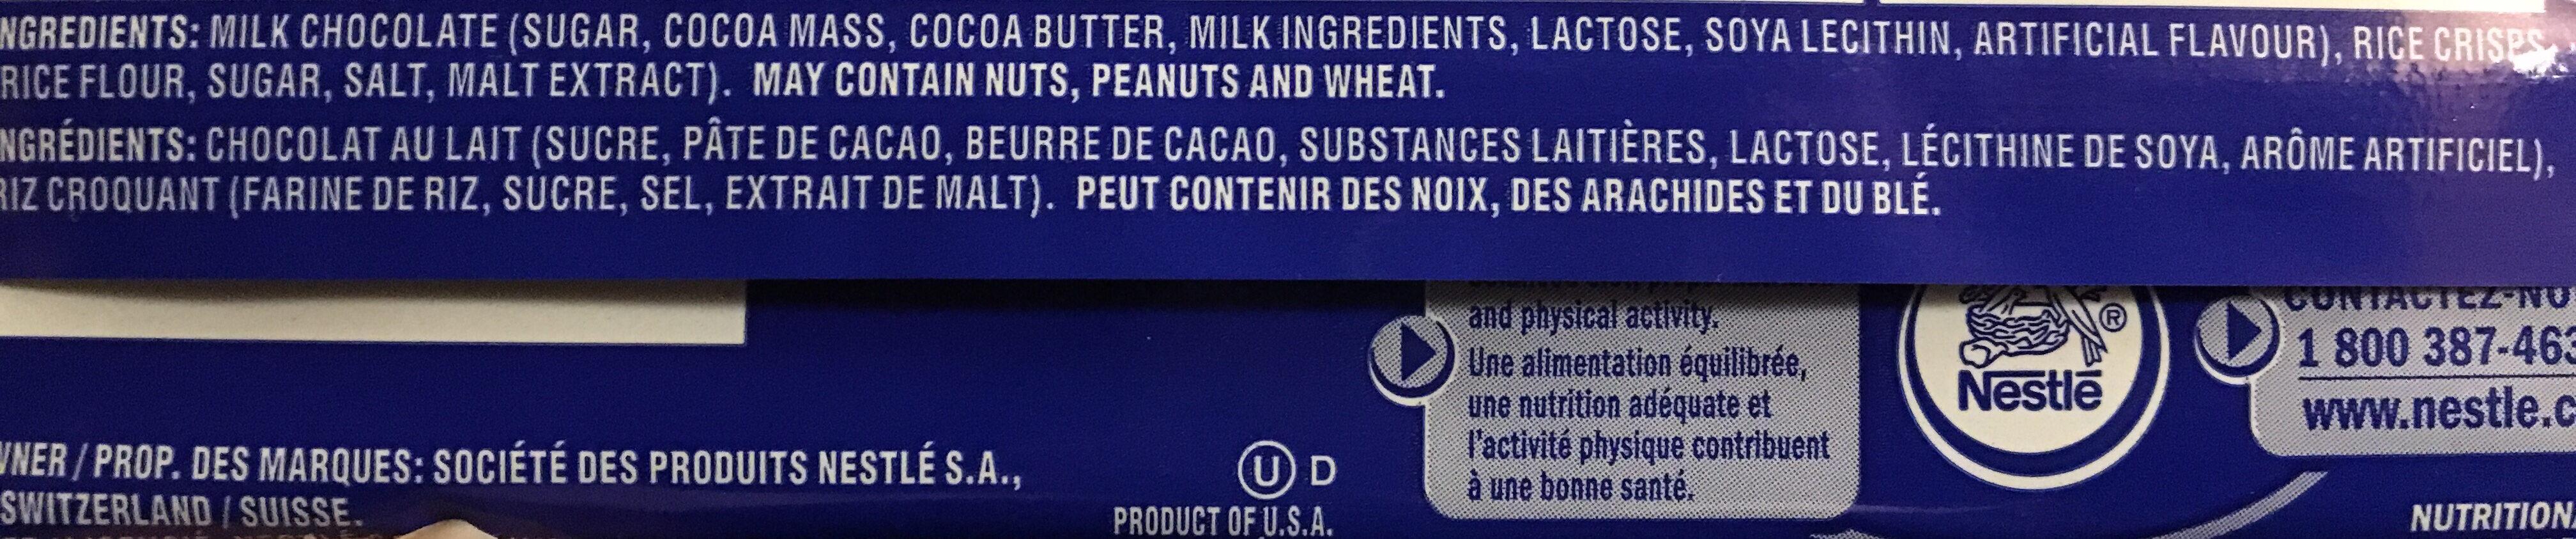 Crunch - Ingredients - en